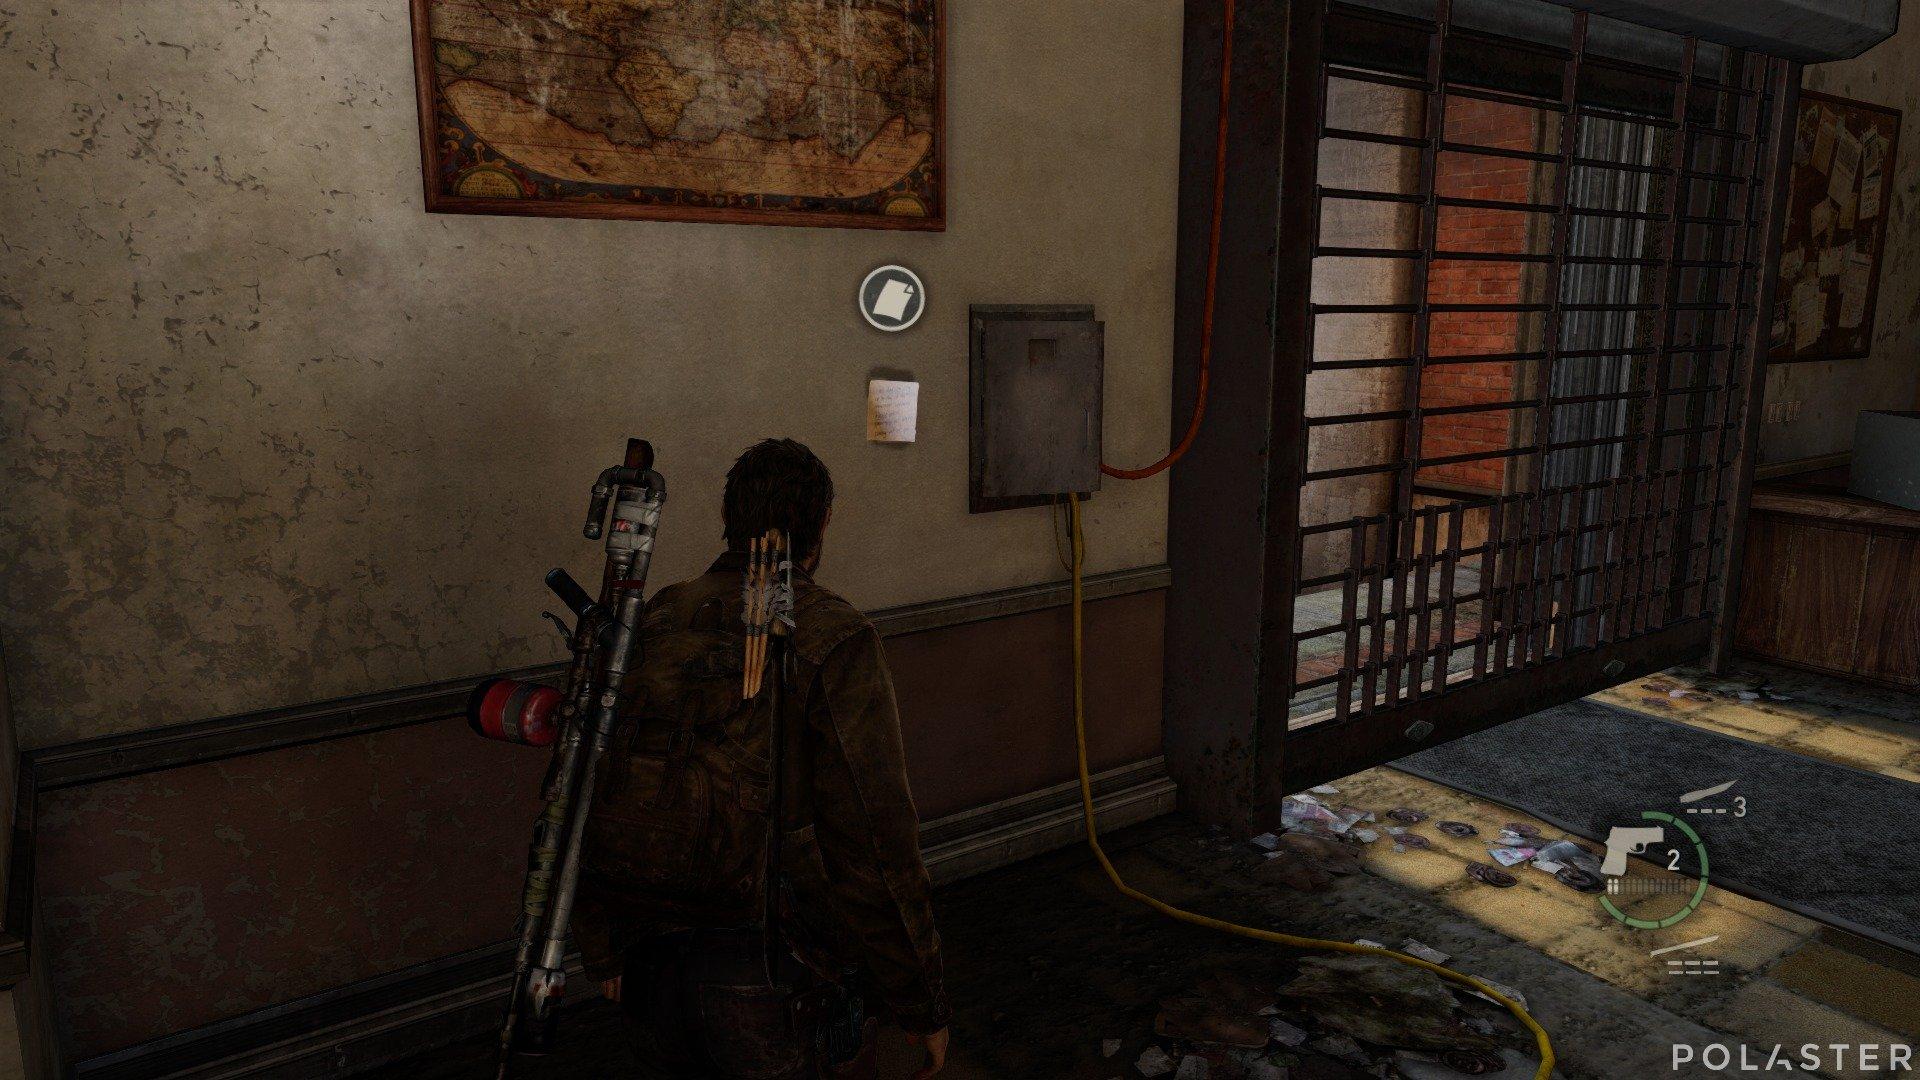 The Last of Us Artefacto Nota del tablón